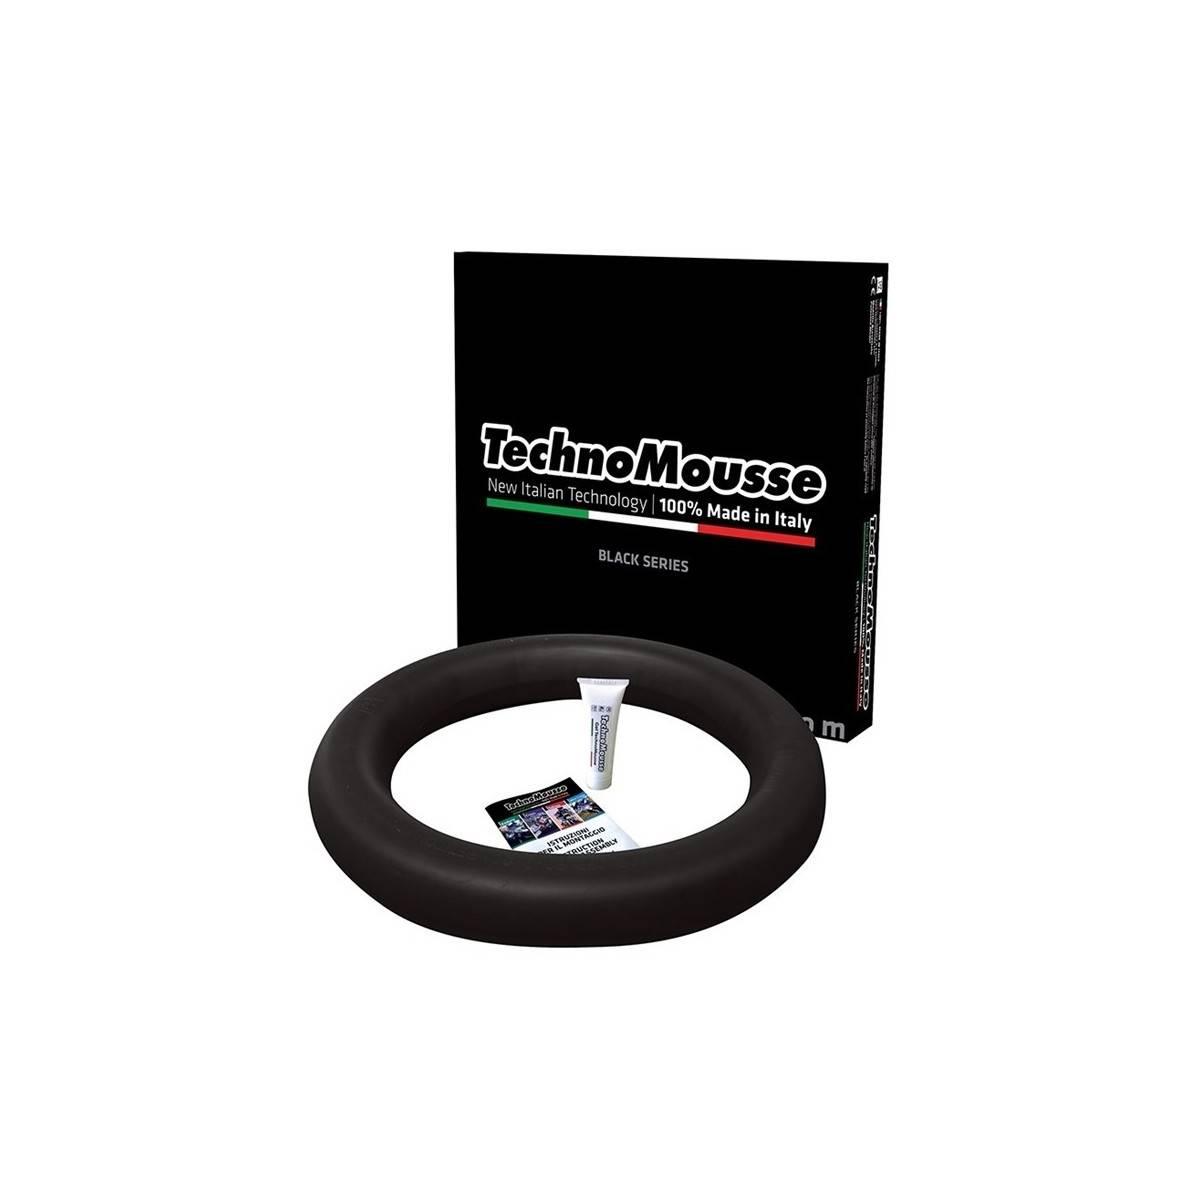 TM14018BK - Technomousse 140 80-18 Negro